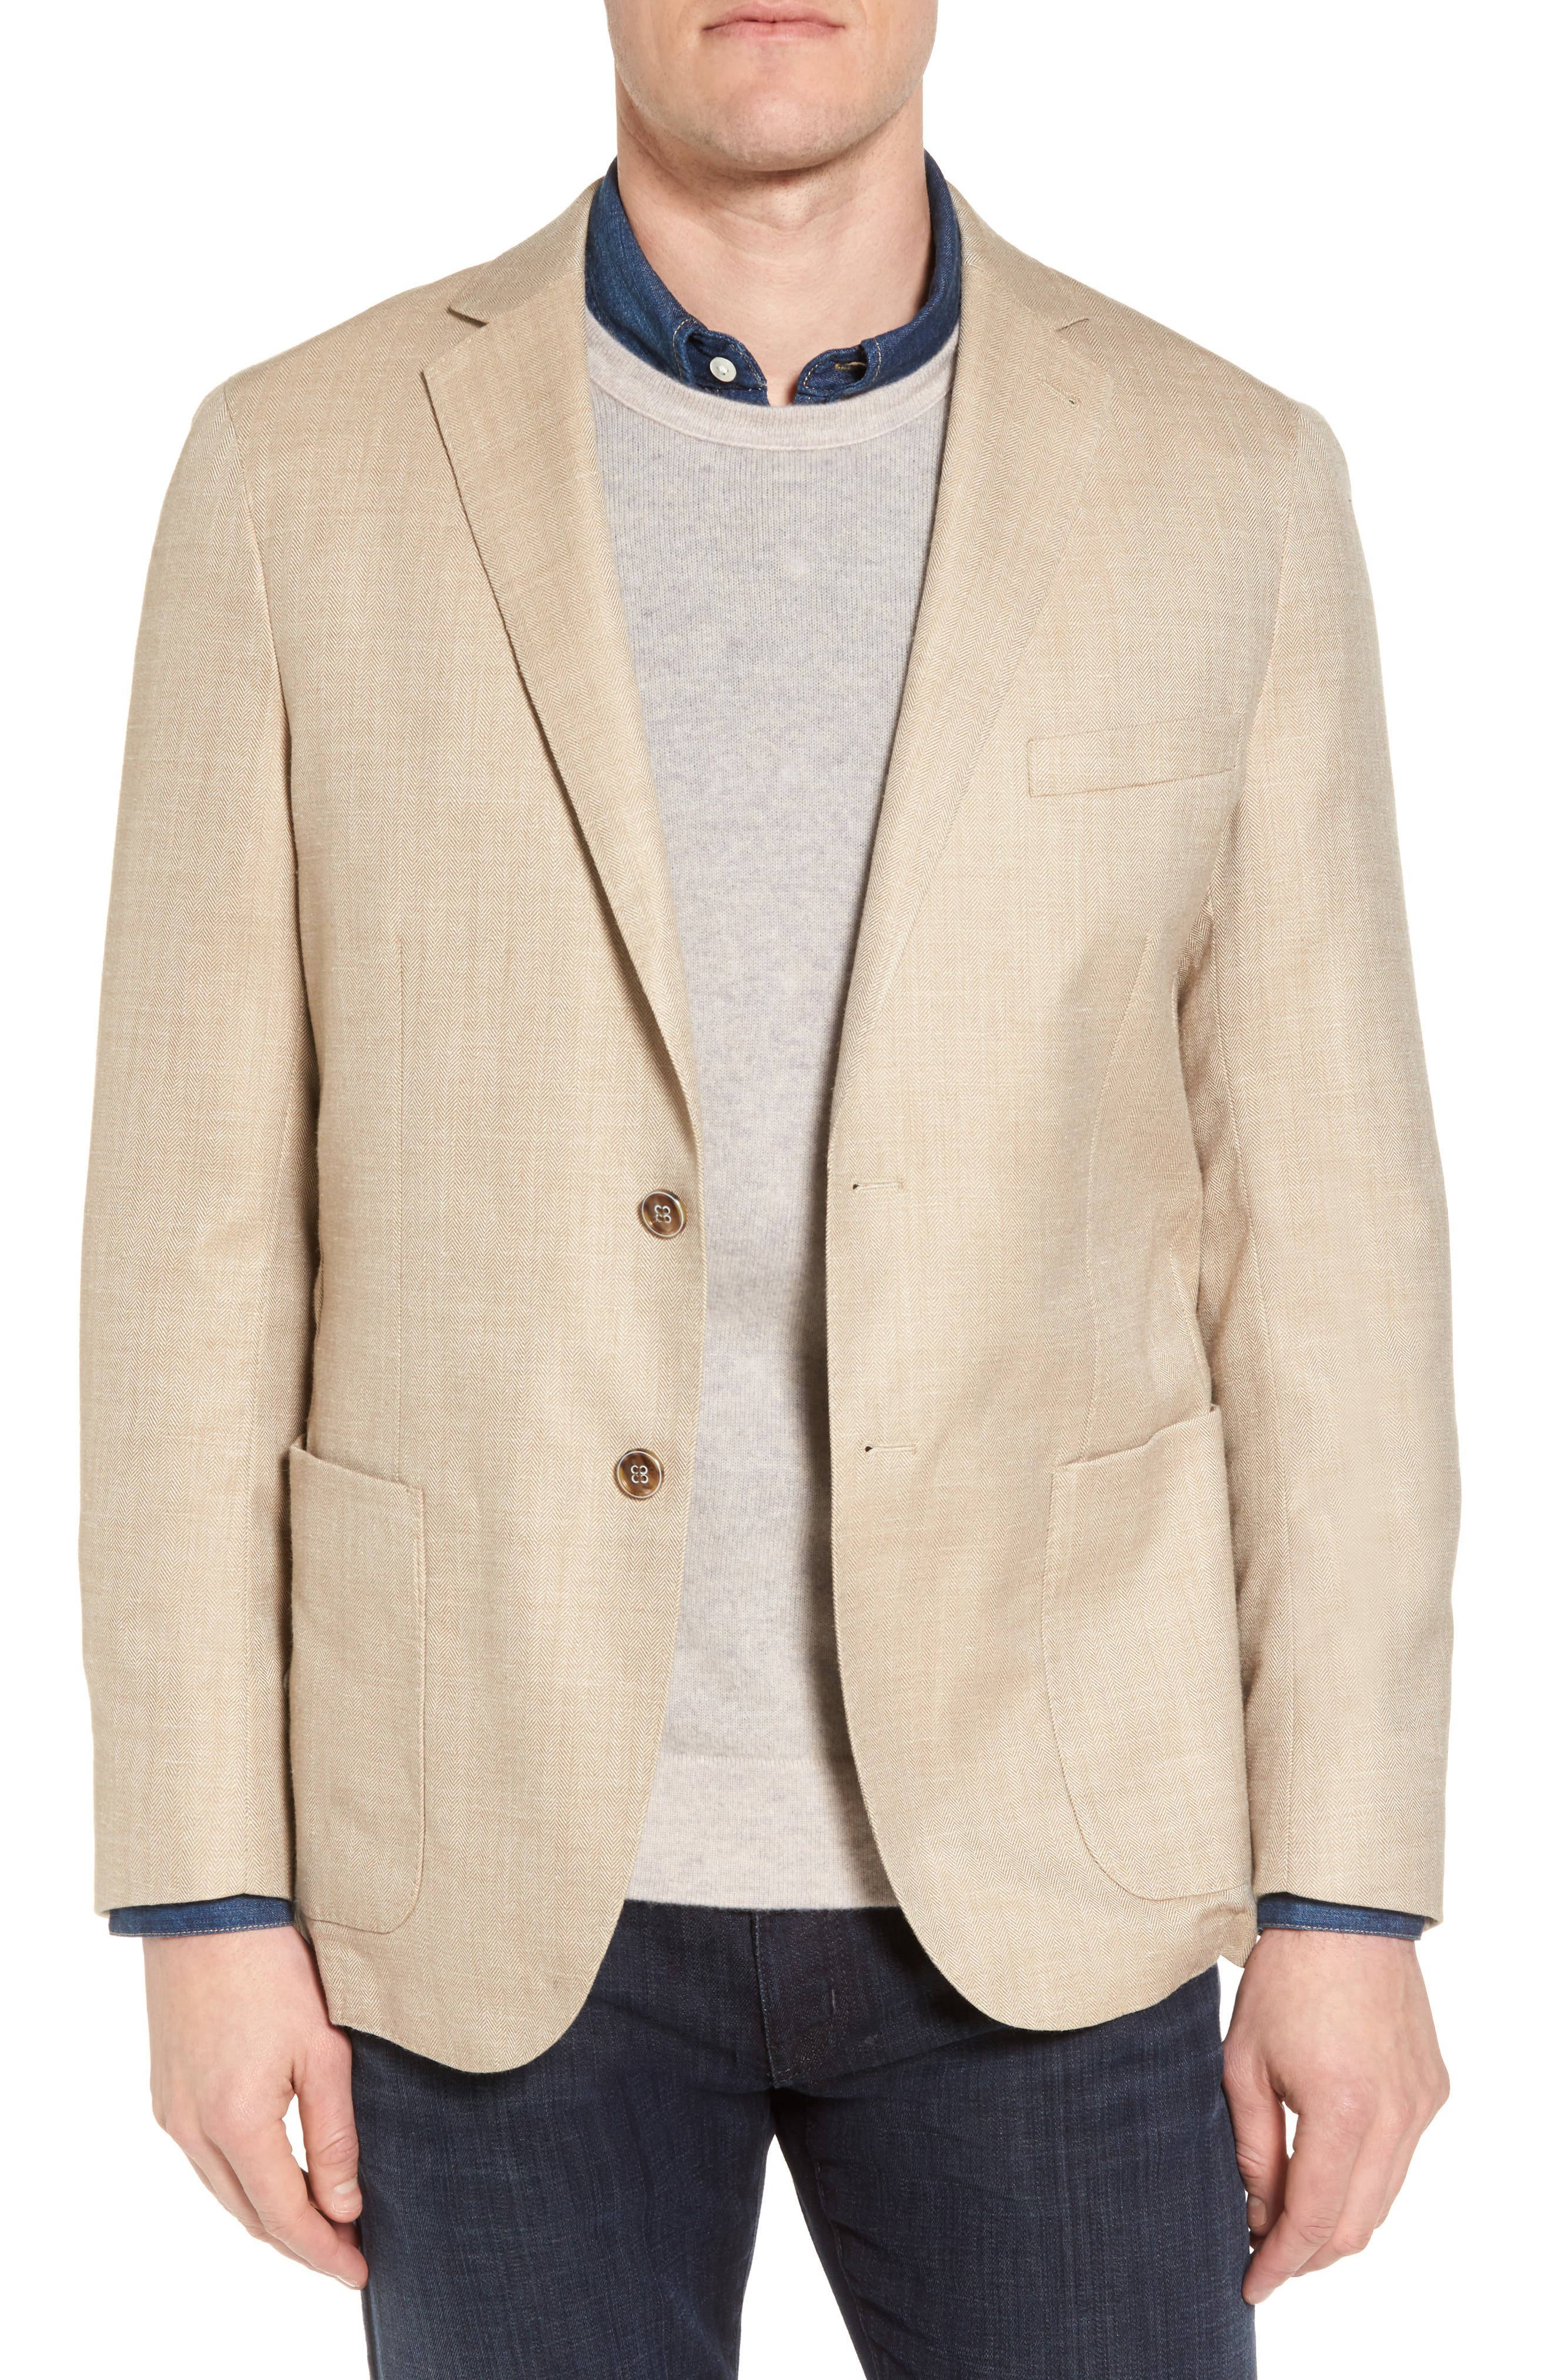 Crown Herringbone Wool & Silk Blend Jacket,                             Main thumbnail 1, color,                             Stone